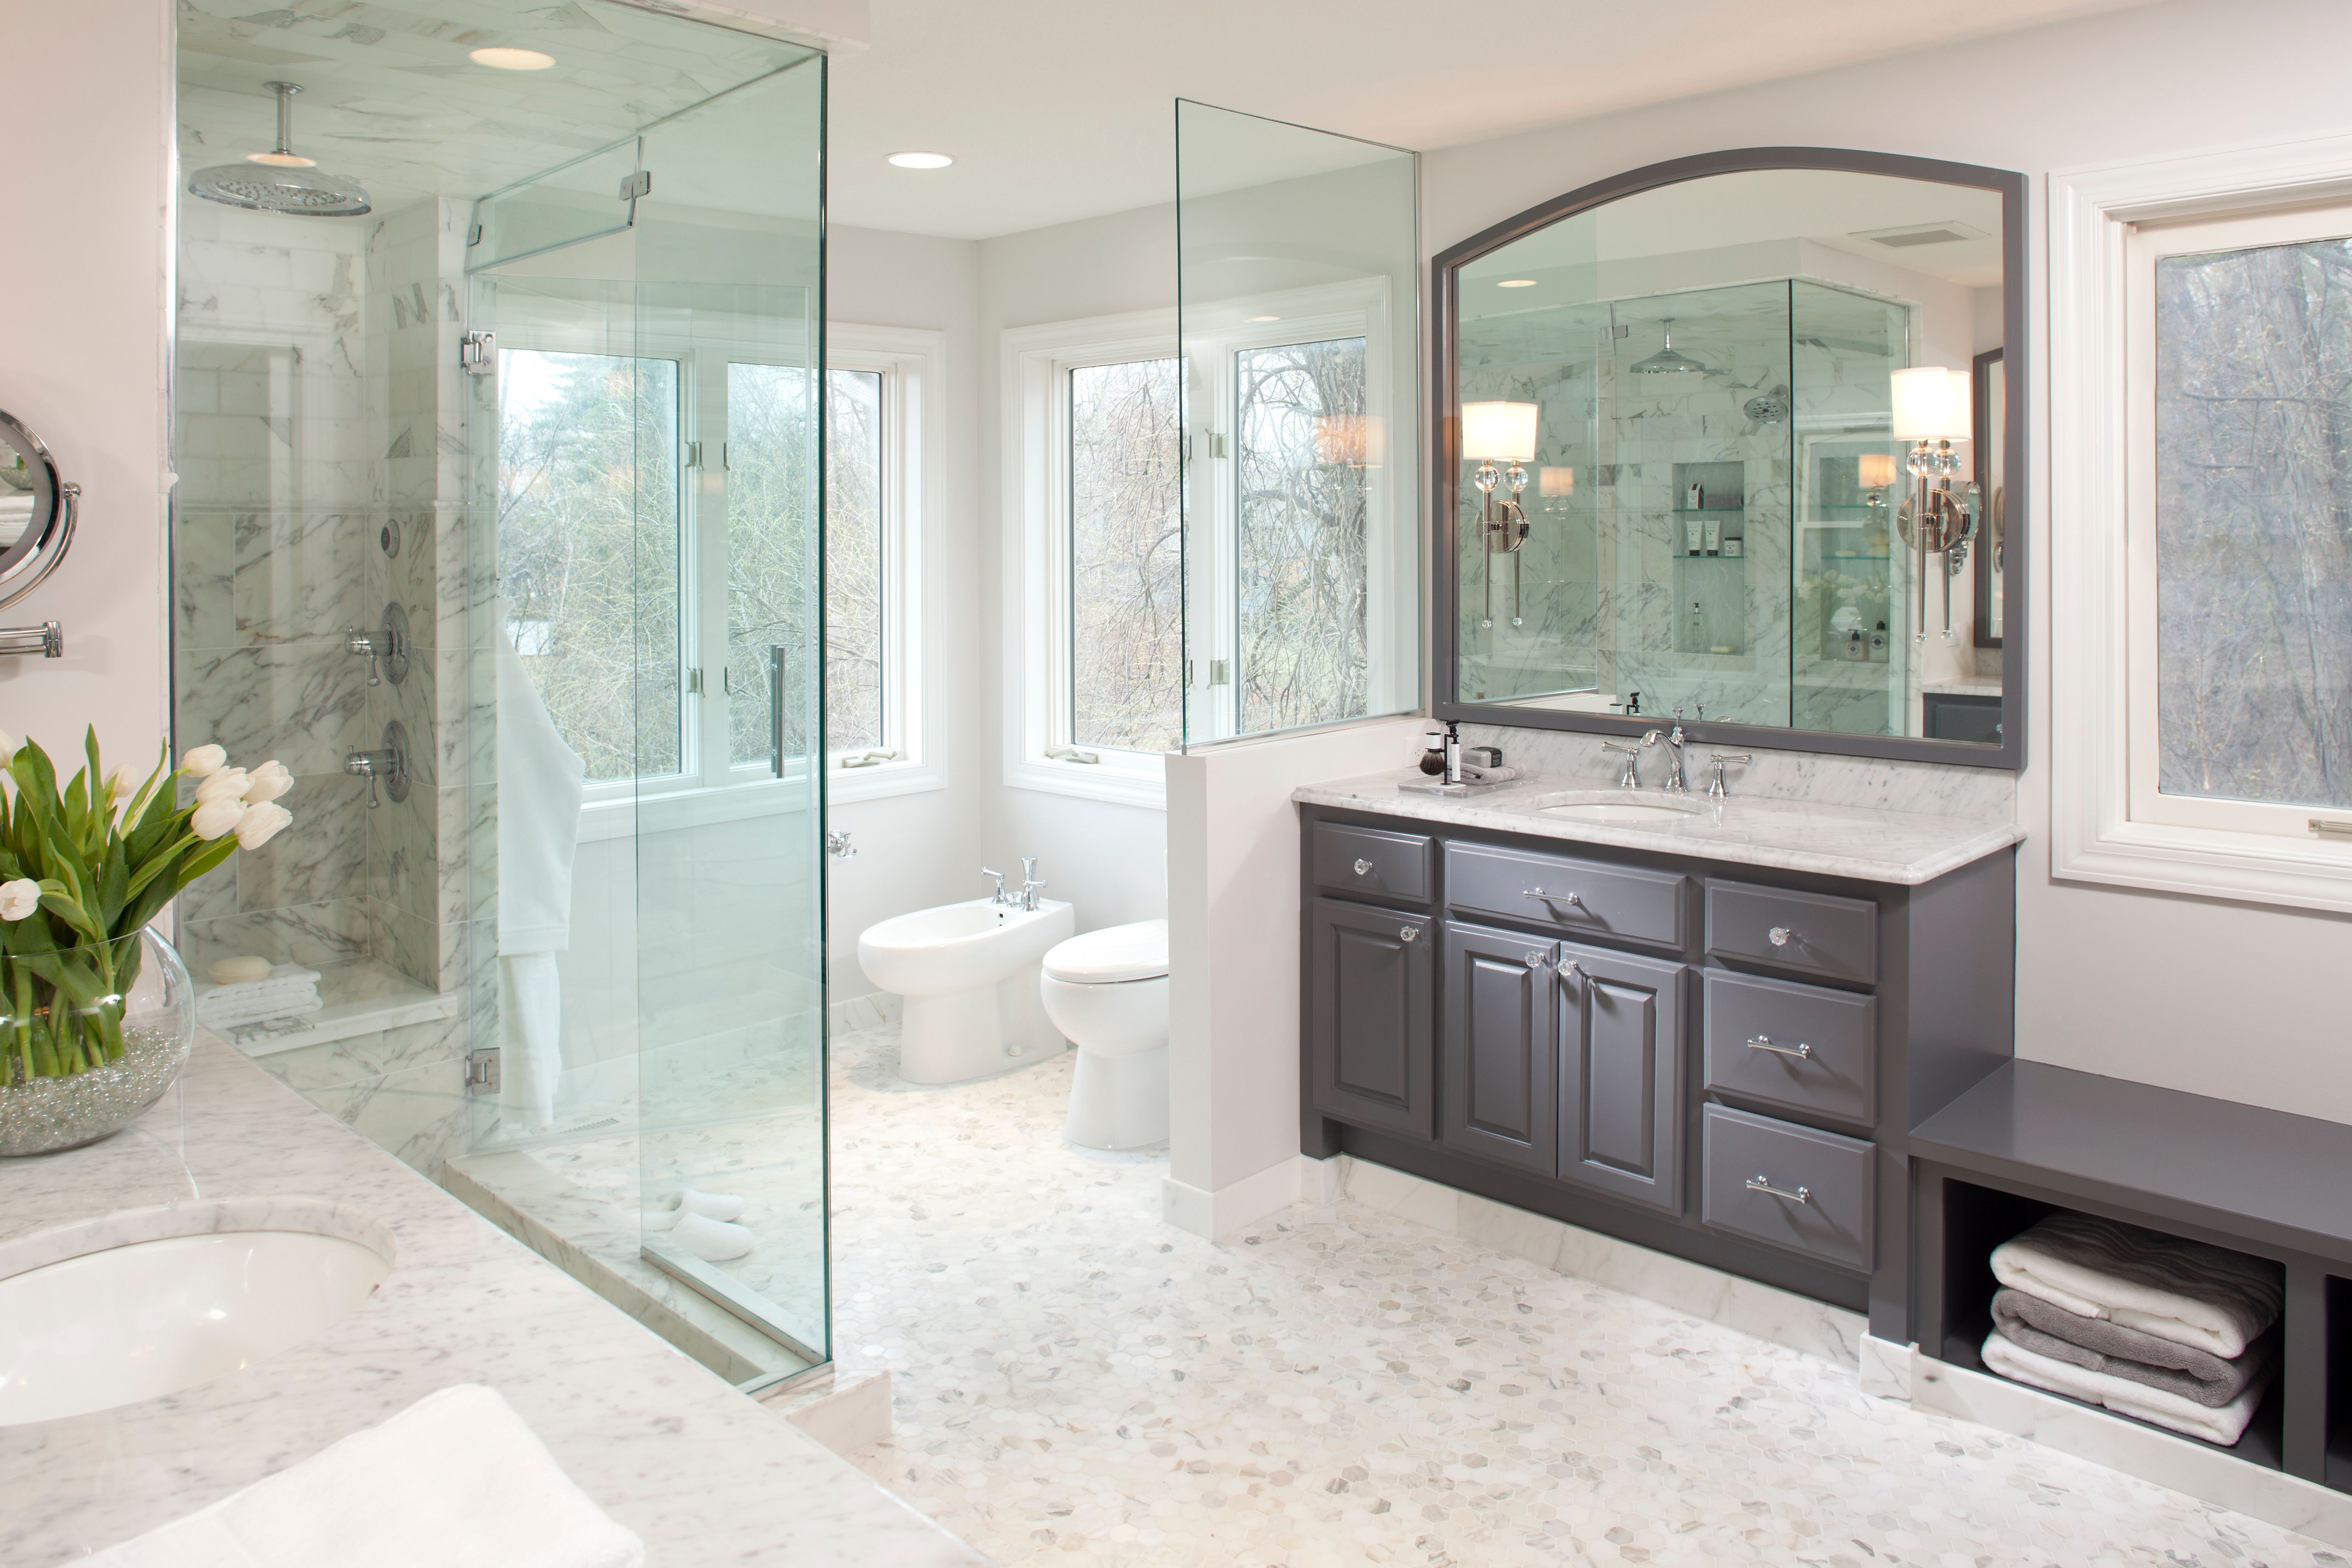 Bathroom Renovations Hgtv Makeovers Luxury Bathroom Bathroom Mirror Chic Bathroom S Bathroom Remodel Cost Budget Bathroom Remodel Bathroom Interior